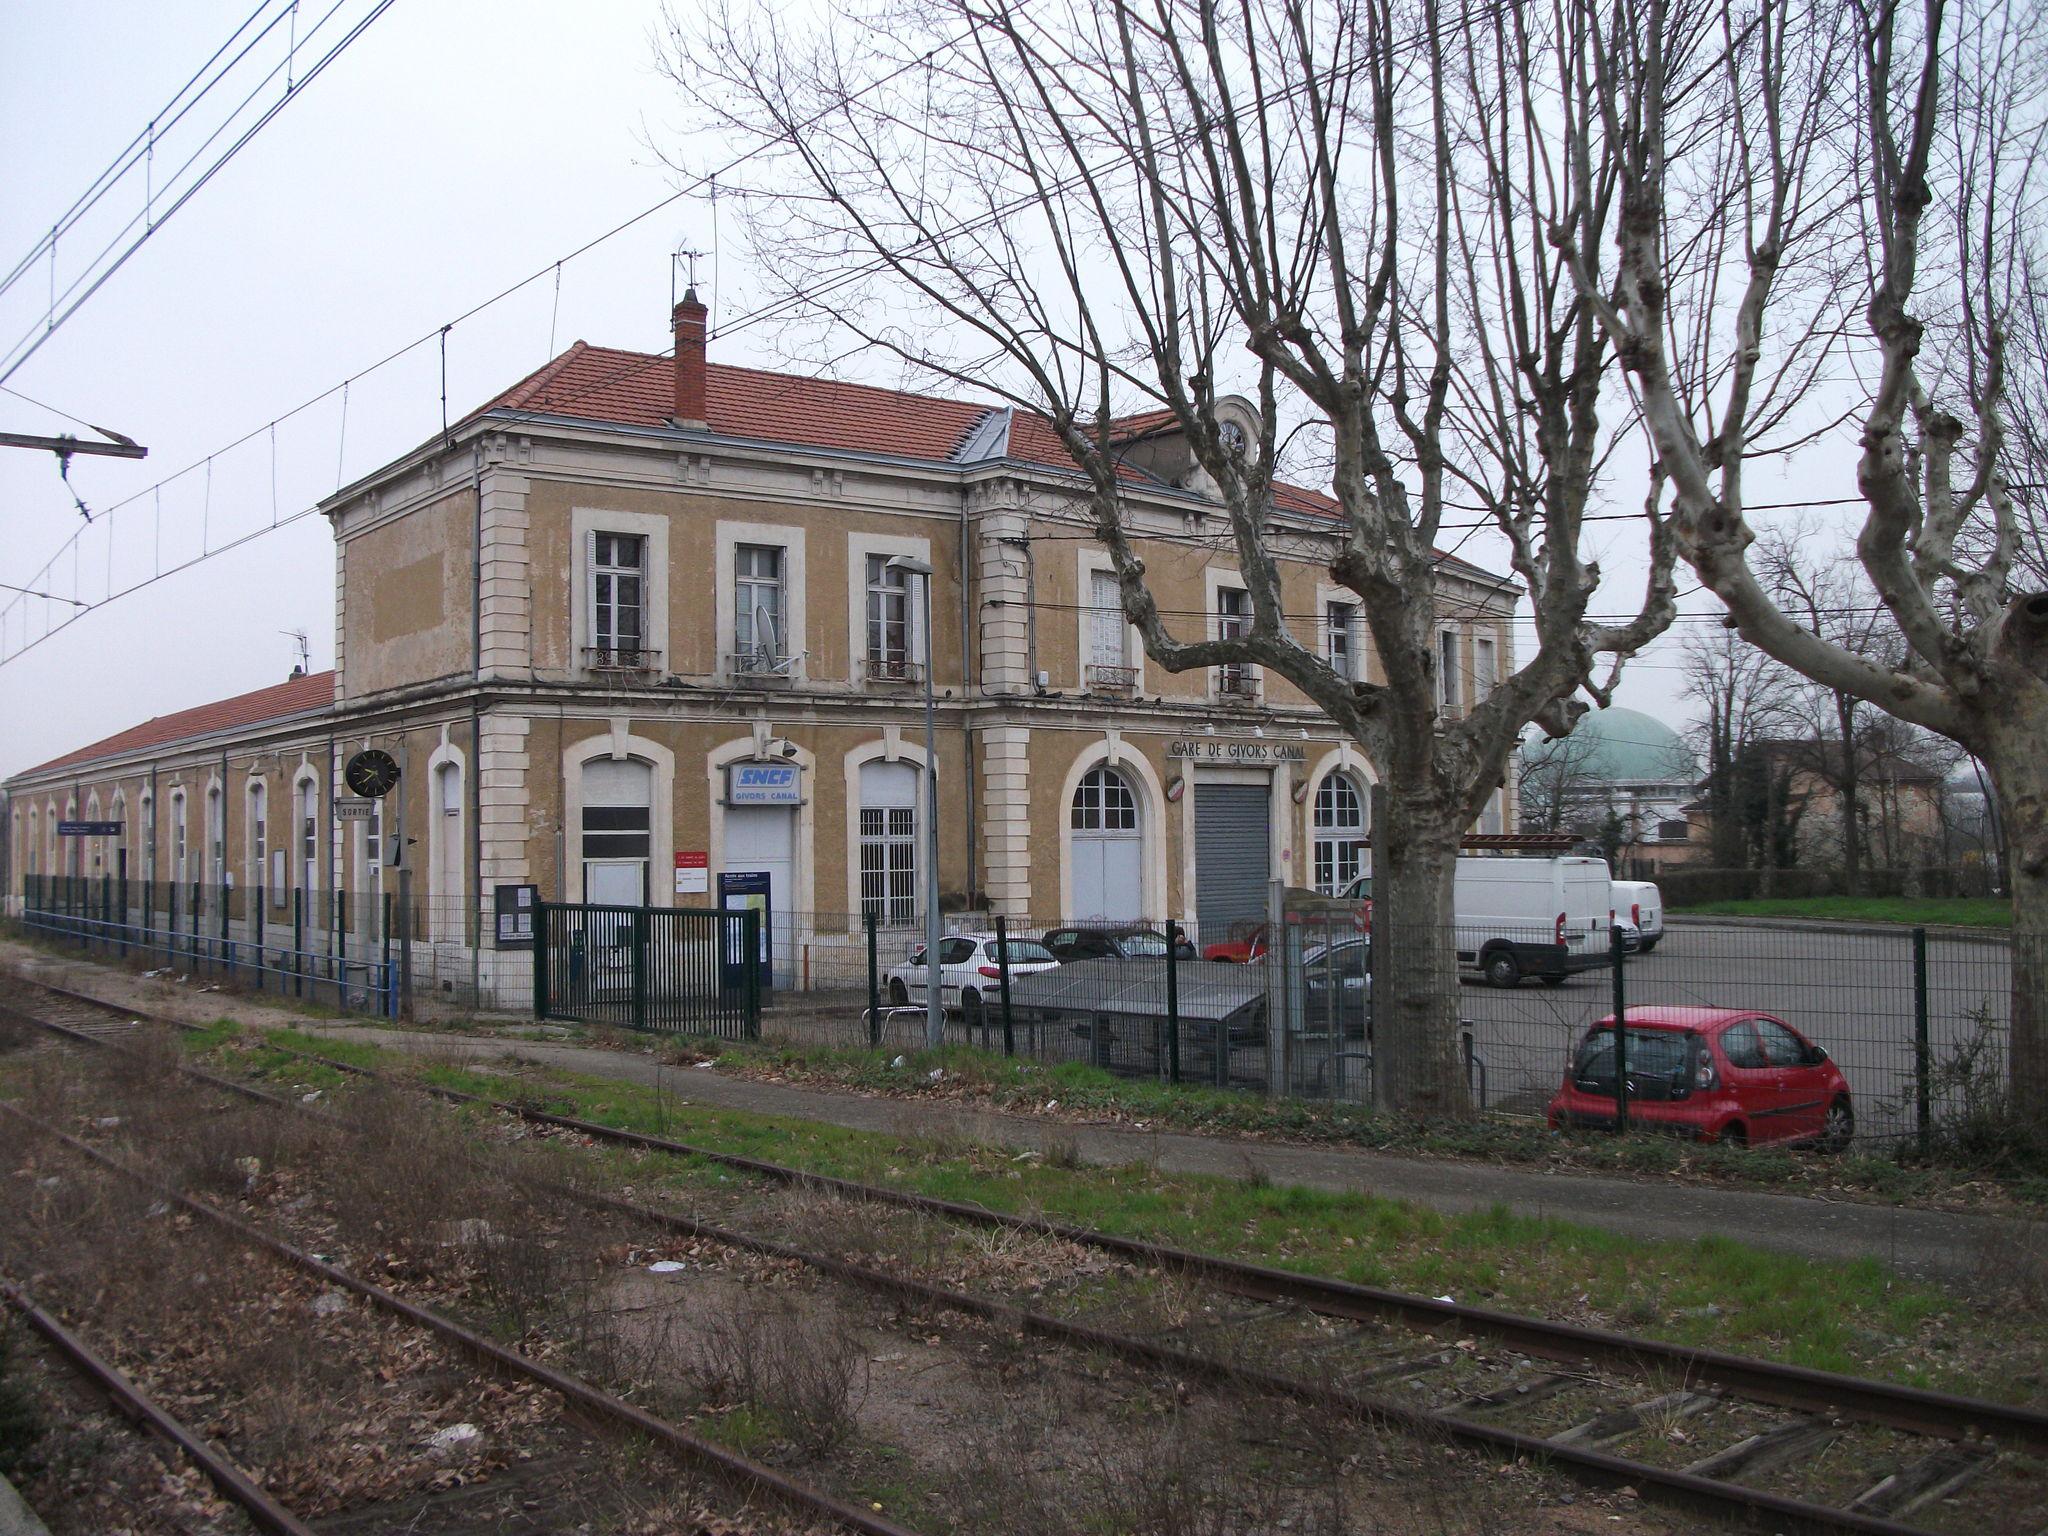 Givors-Canal (Rhône)